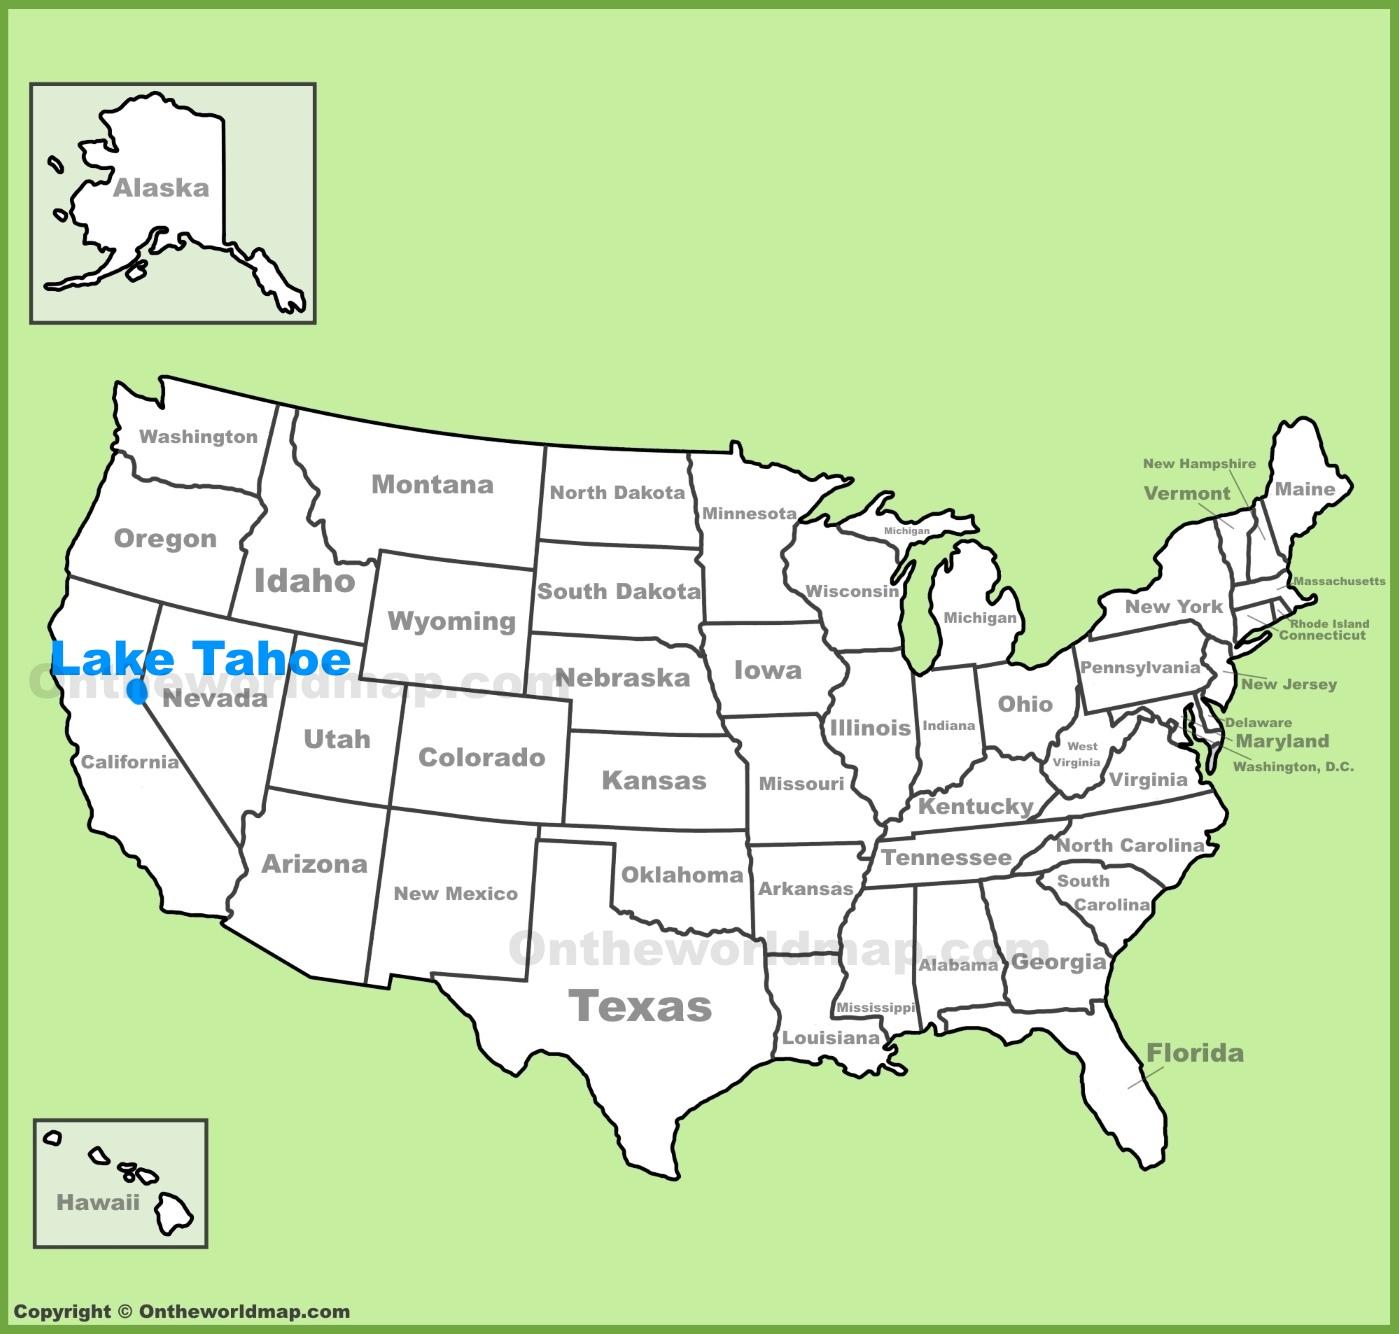 Map Lake Tahoe Lake Tahoe location on the U.S. Map